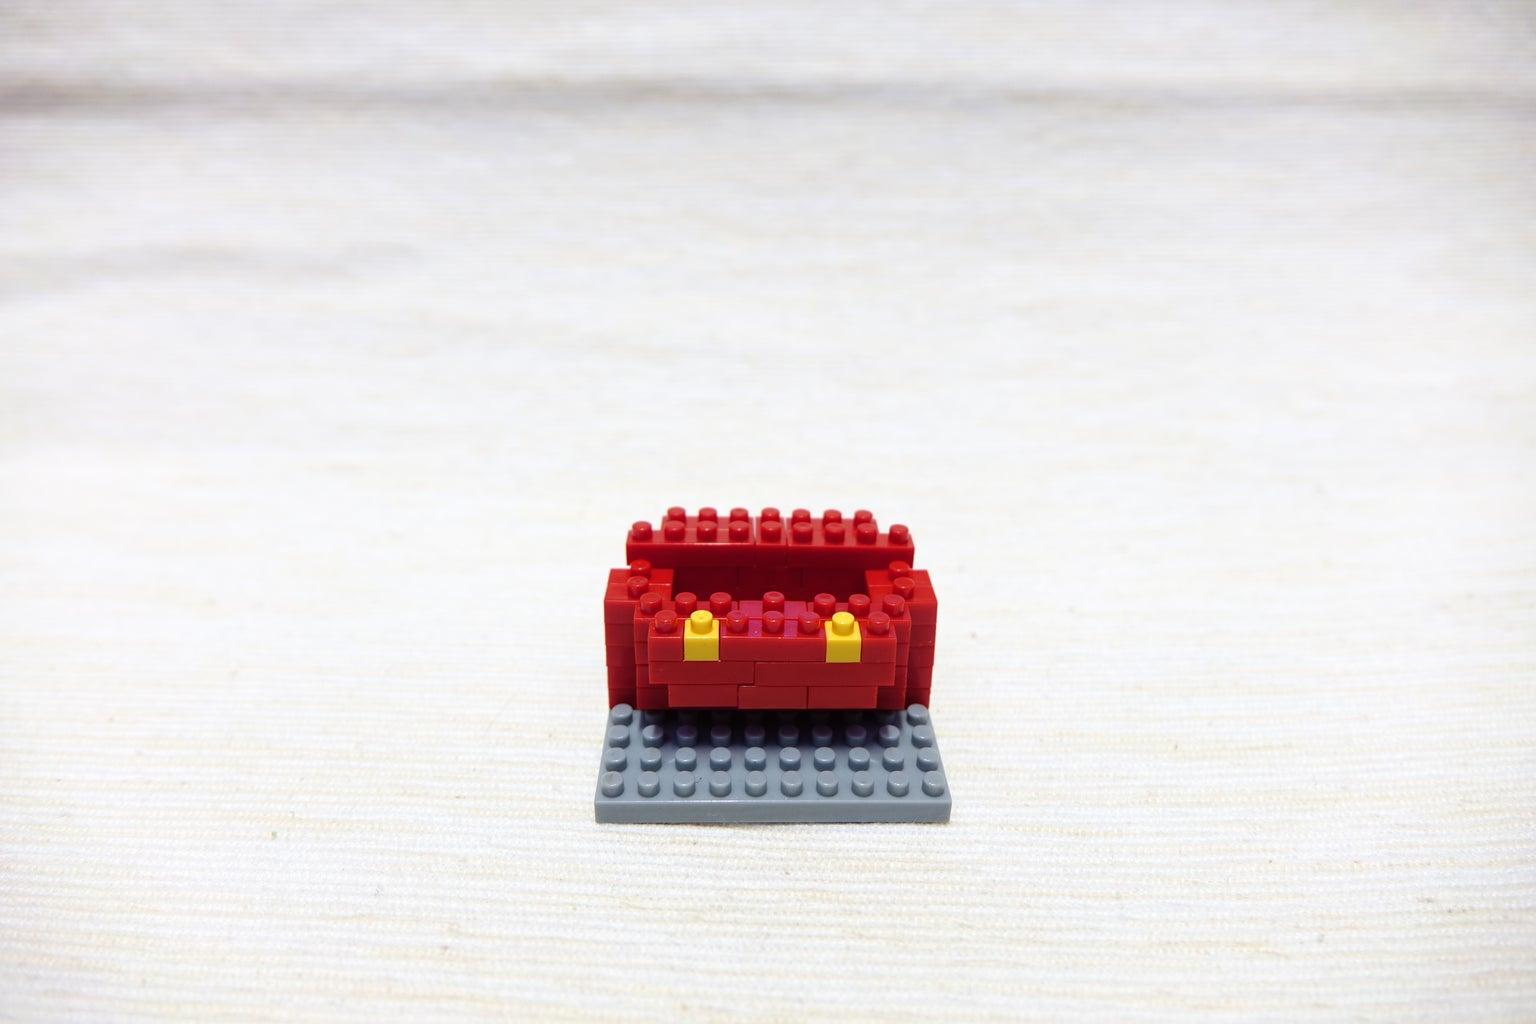 Red Block 1*4, 1*4